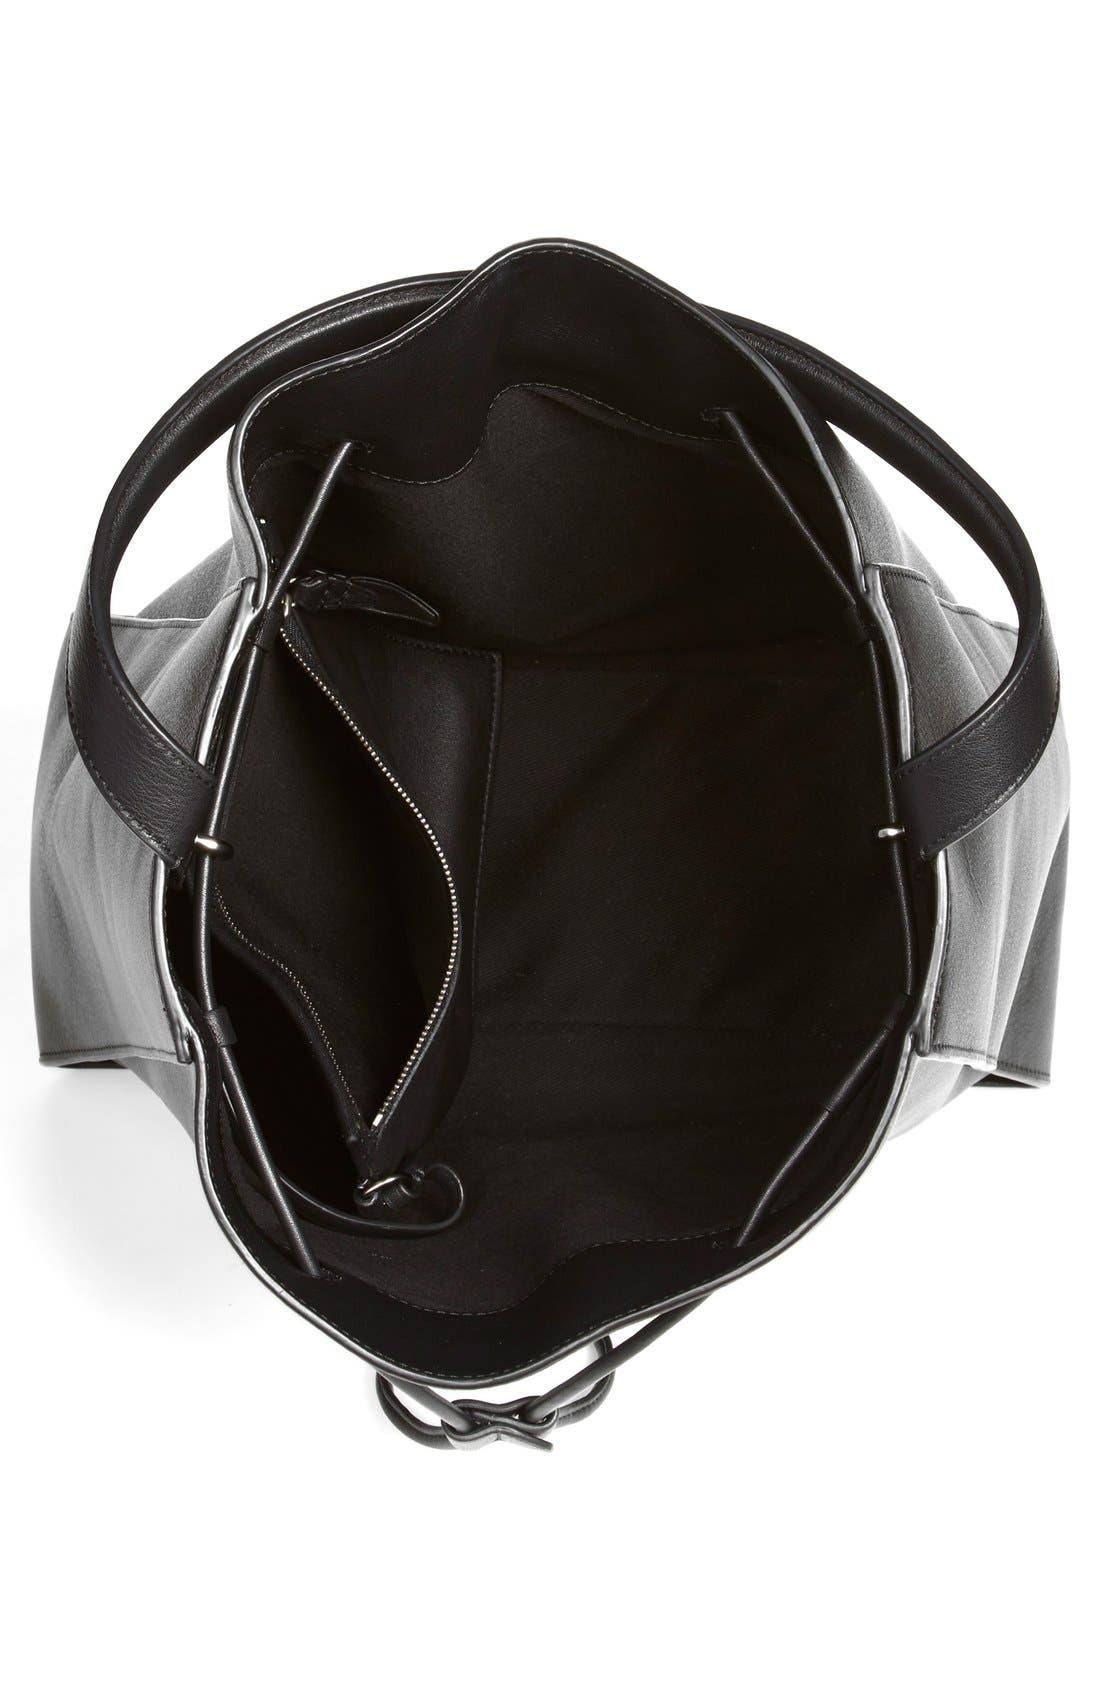 Alternate Image 3  - 3.1 Phillip Lim 'Large Soleil' Leather Bucket Bag